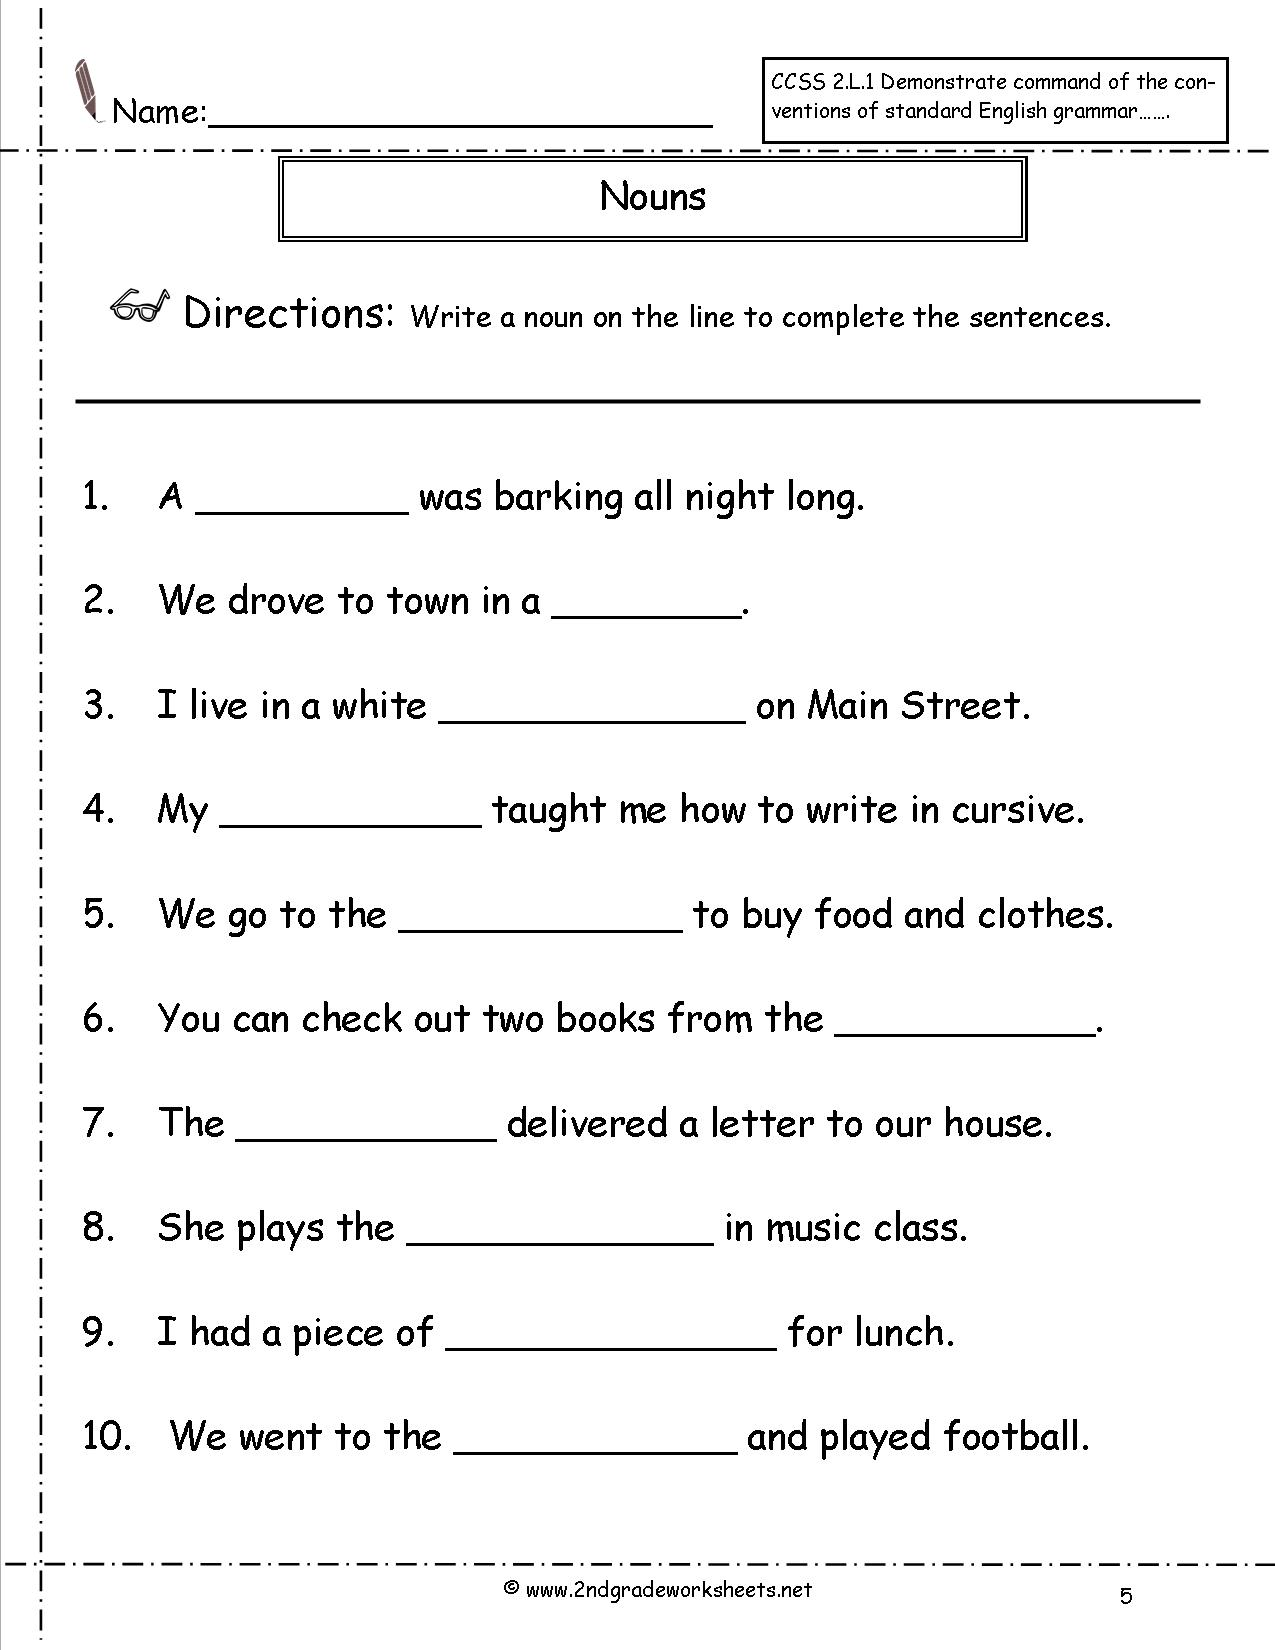 15 Best Images Of Proper Pronouns Worksheets